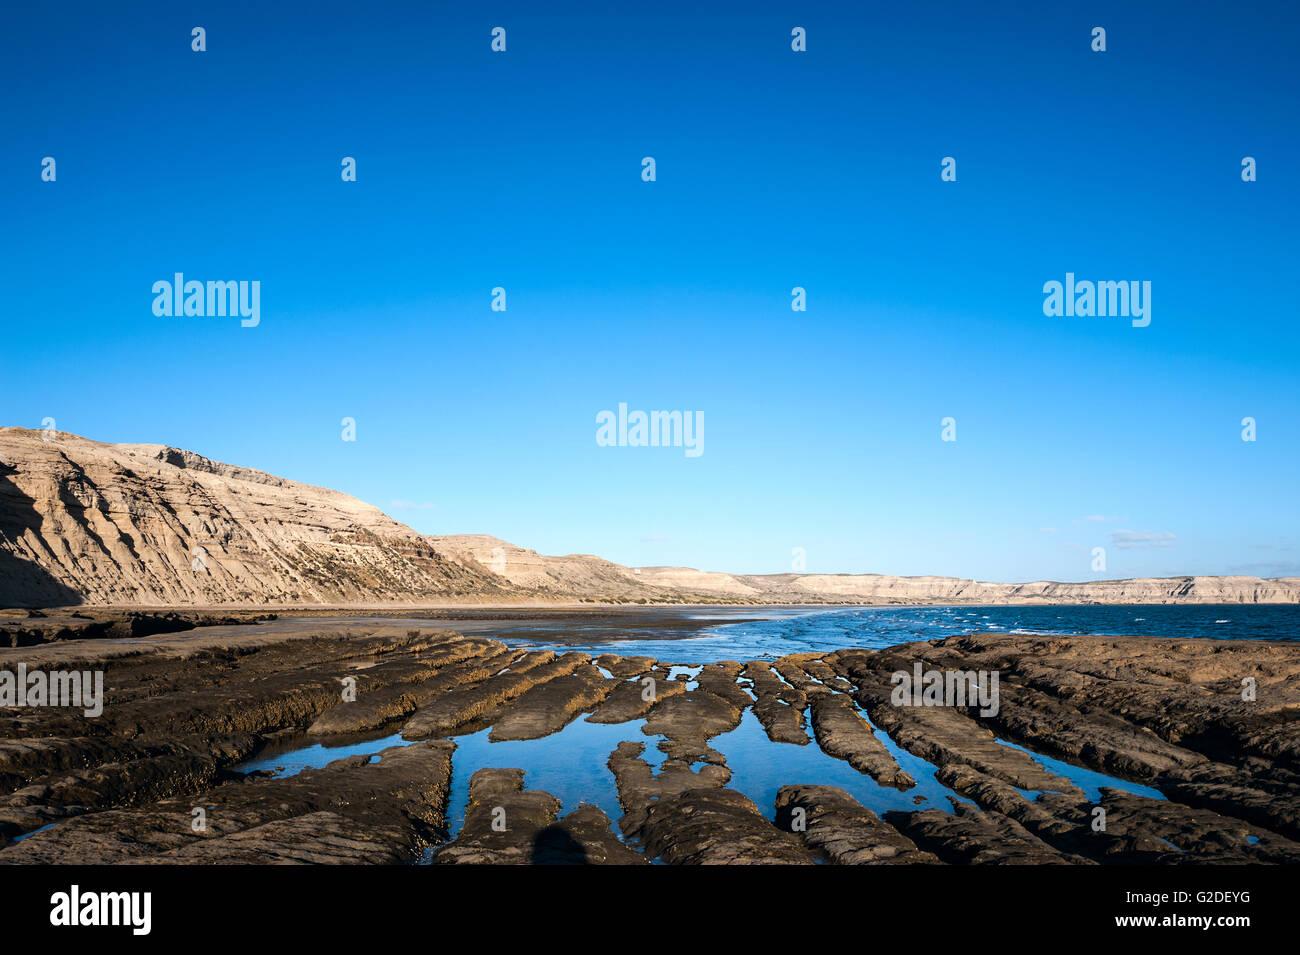 Patagonien Küste, Halbinsel Valdés, Argentinien Stockbild